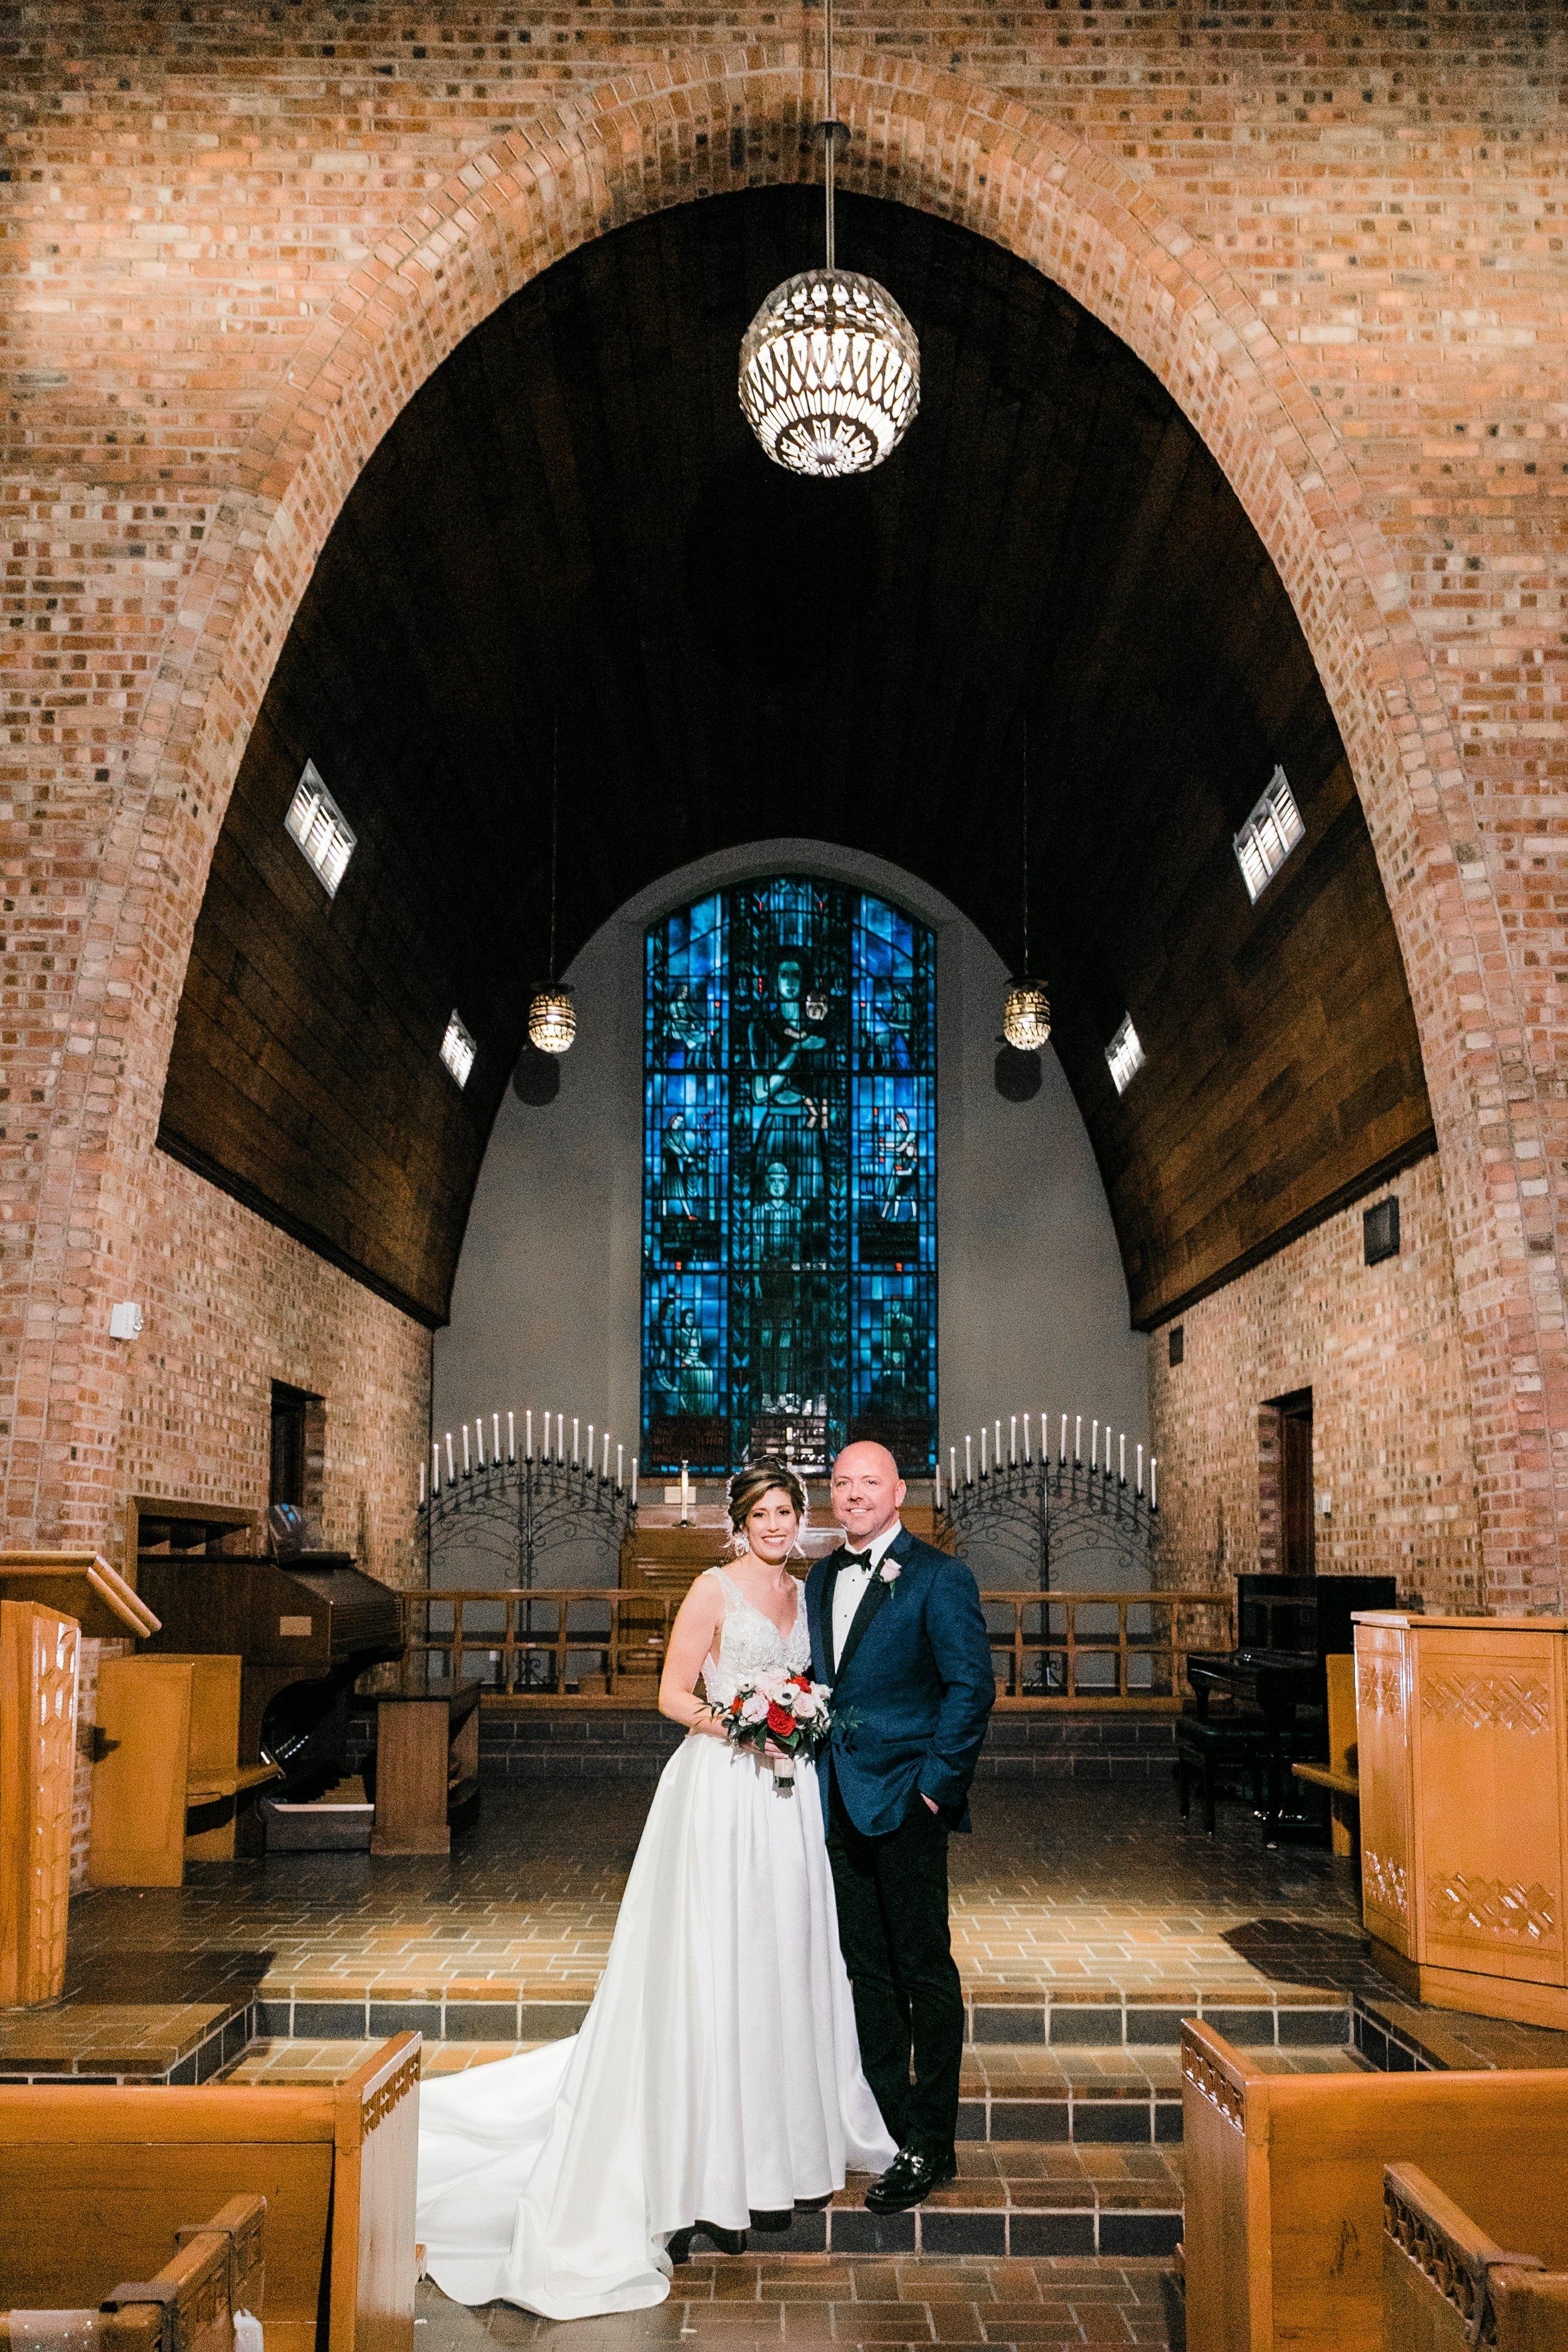 haehn-wedding-little-chapel-in-the-woods-denton-tx-lantana-golf-club-wedding-037.jpg